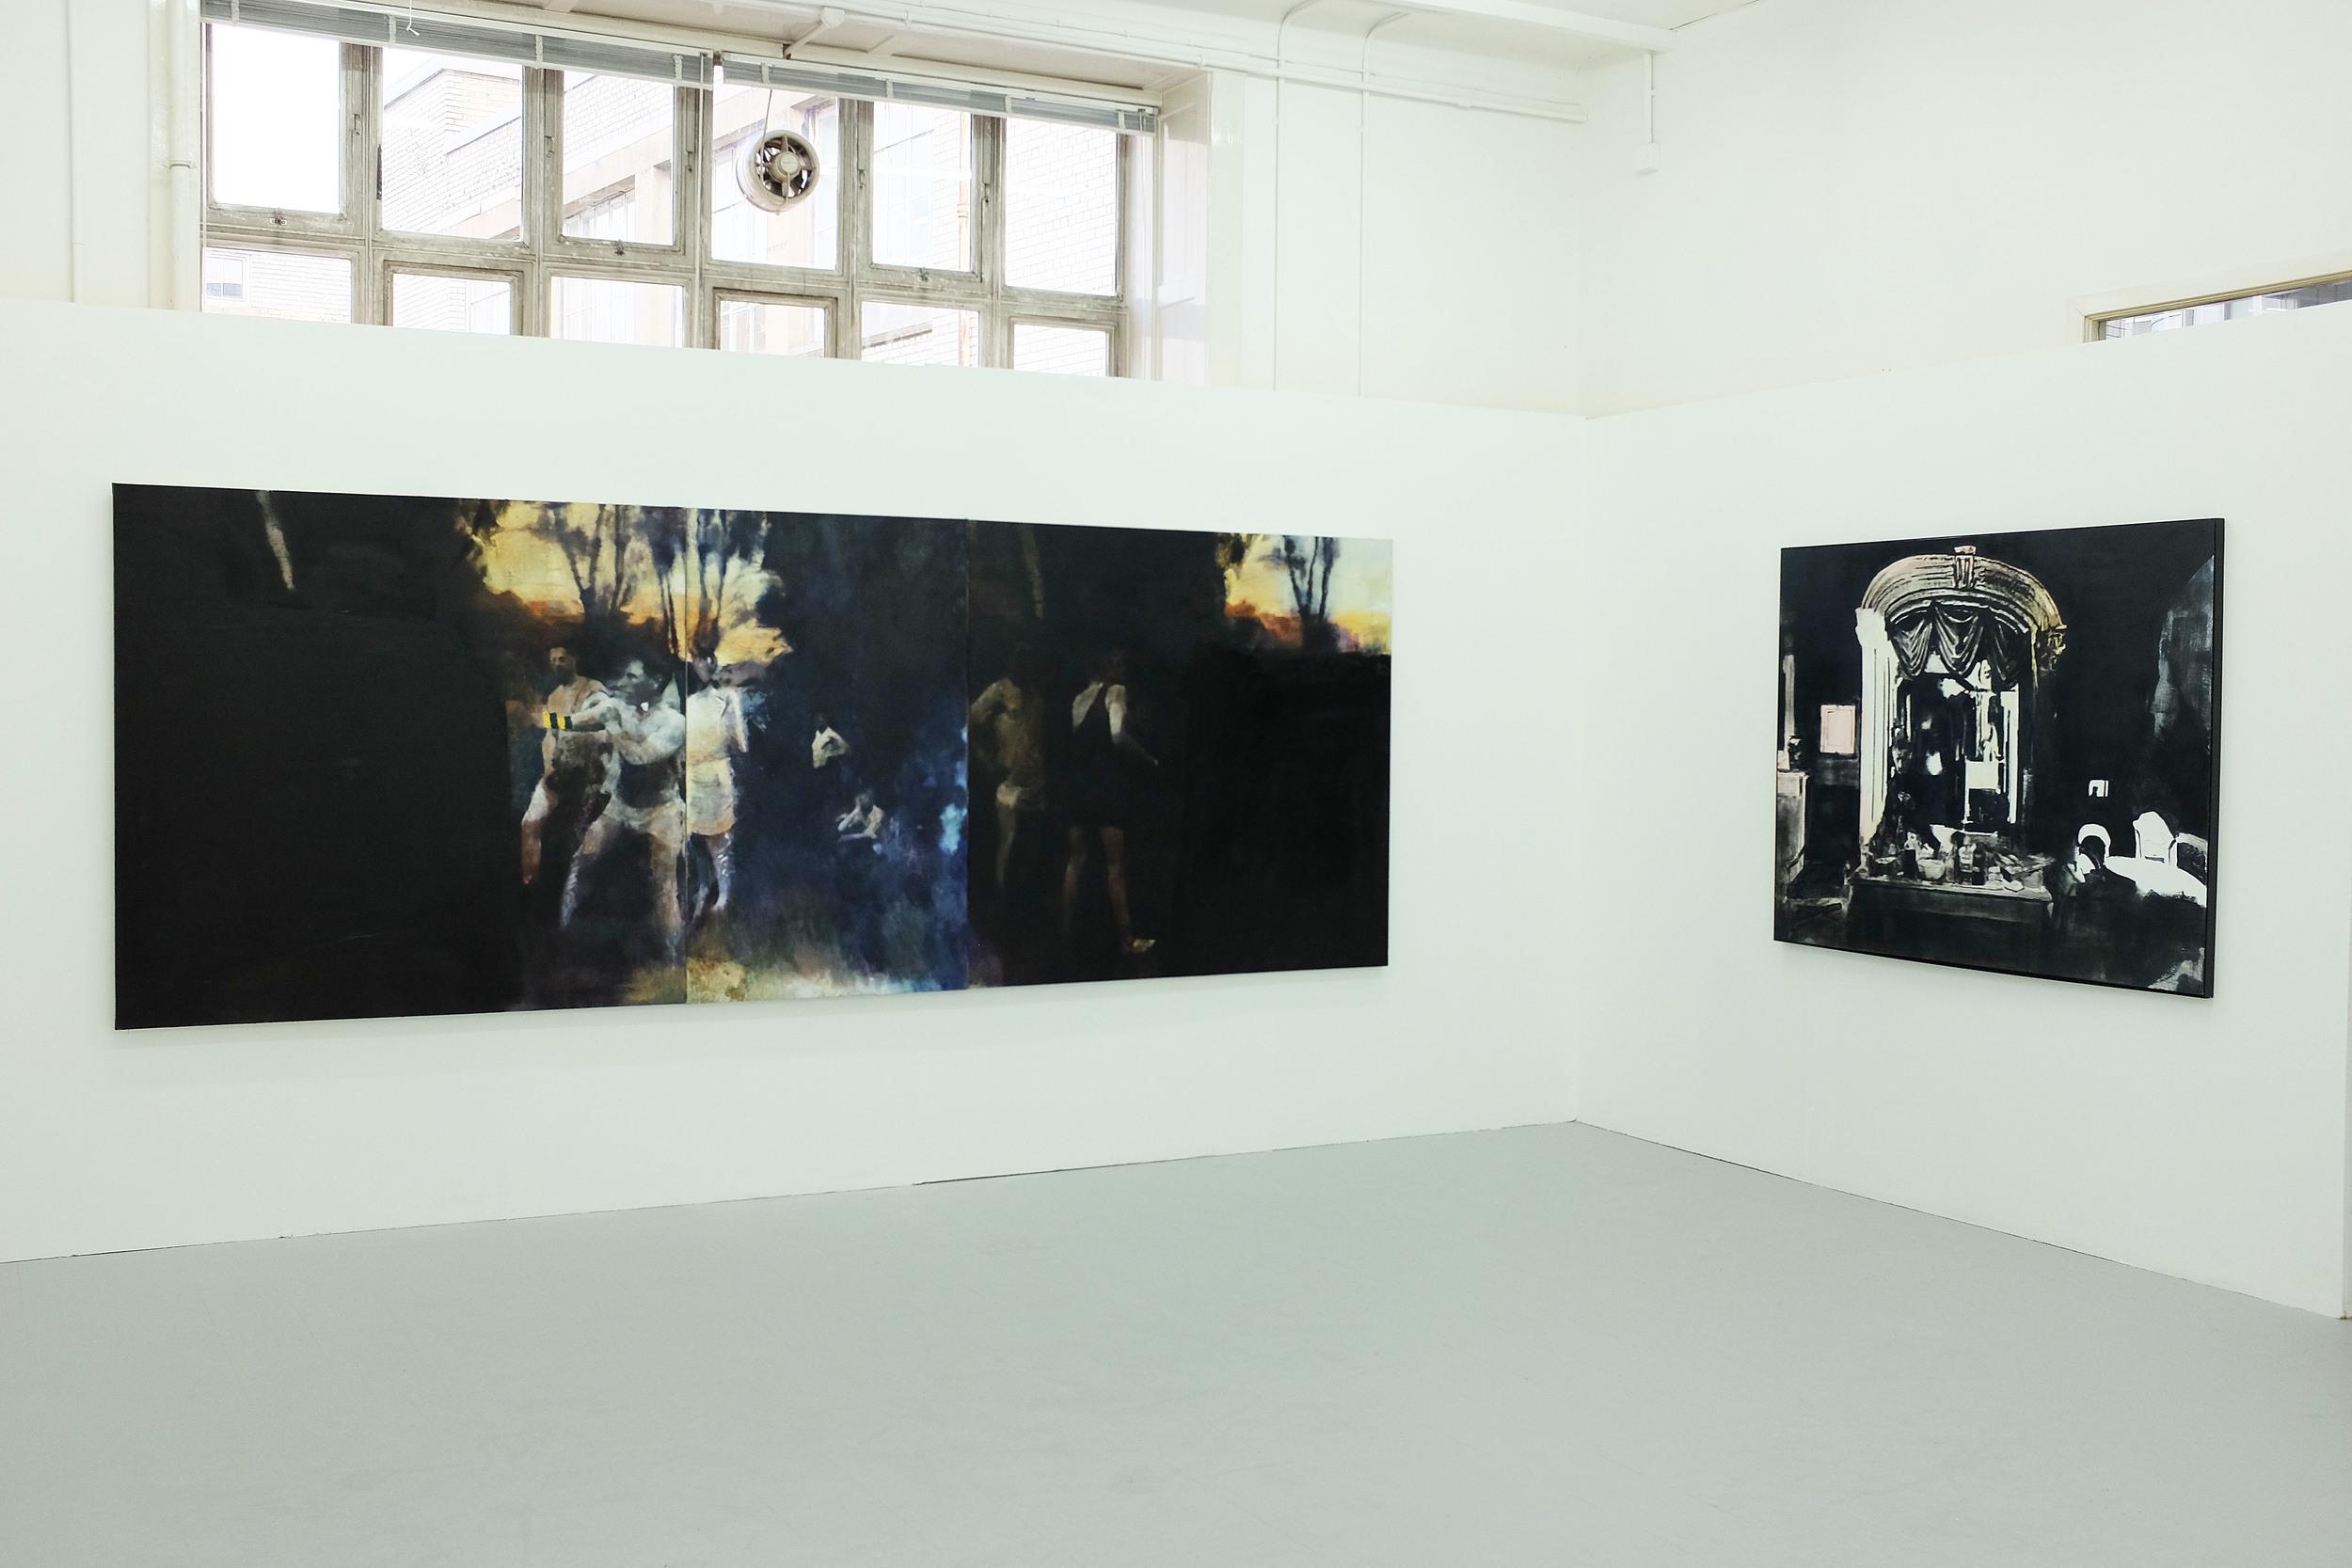 Glasgow School of Art Degree show Install 2016